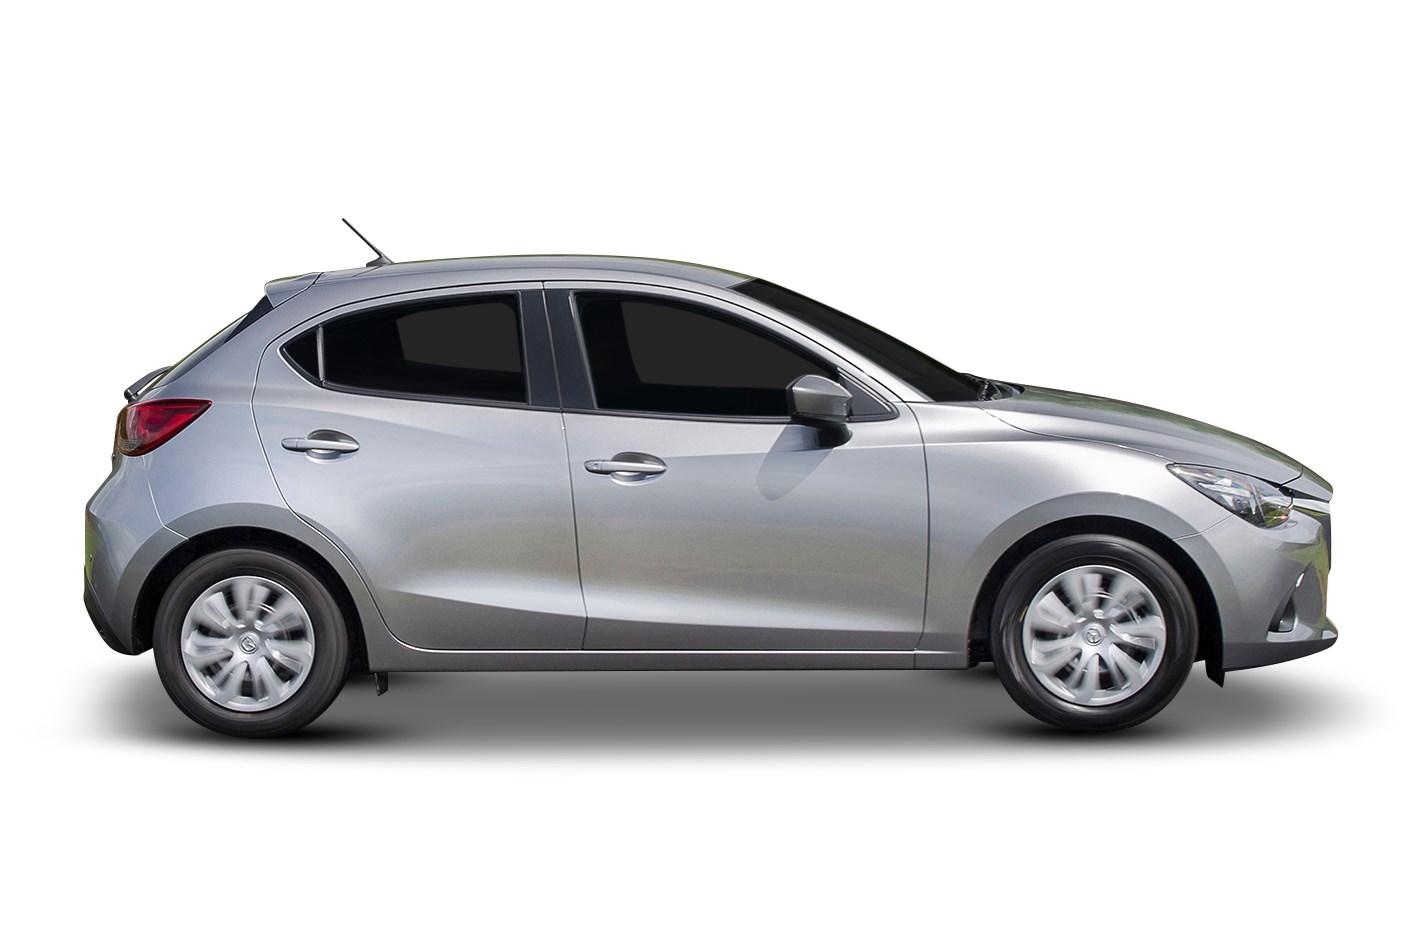 2018 mazda 2 neo, 1.5l 4cyl petrol automatic, hatchback